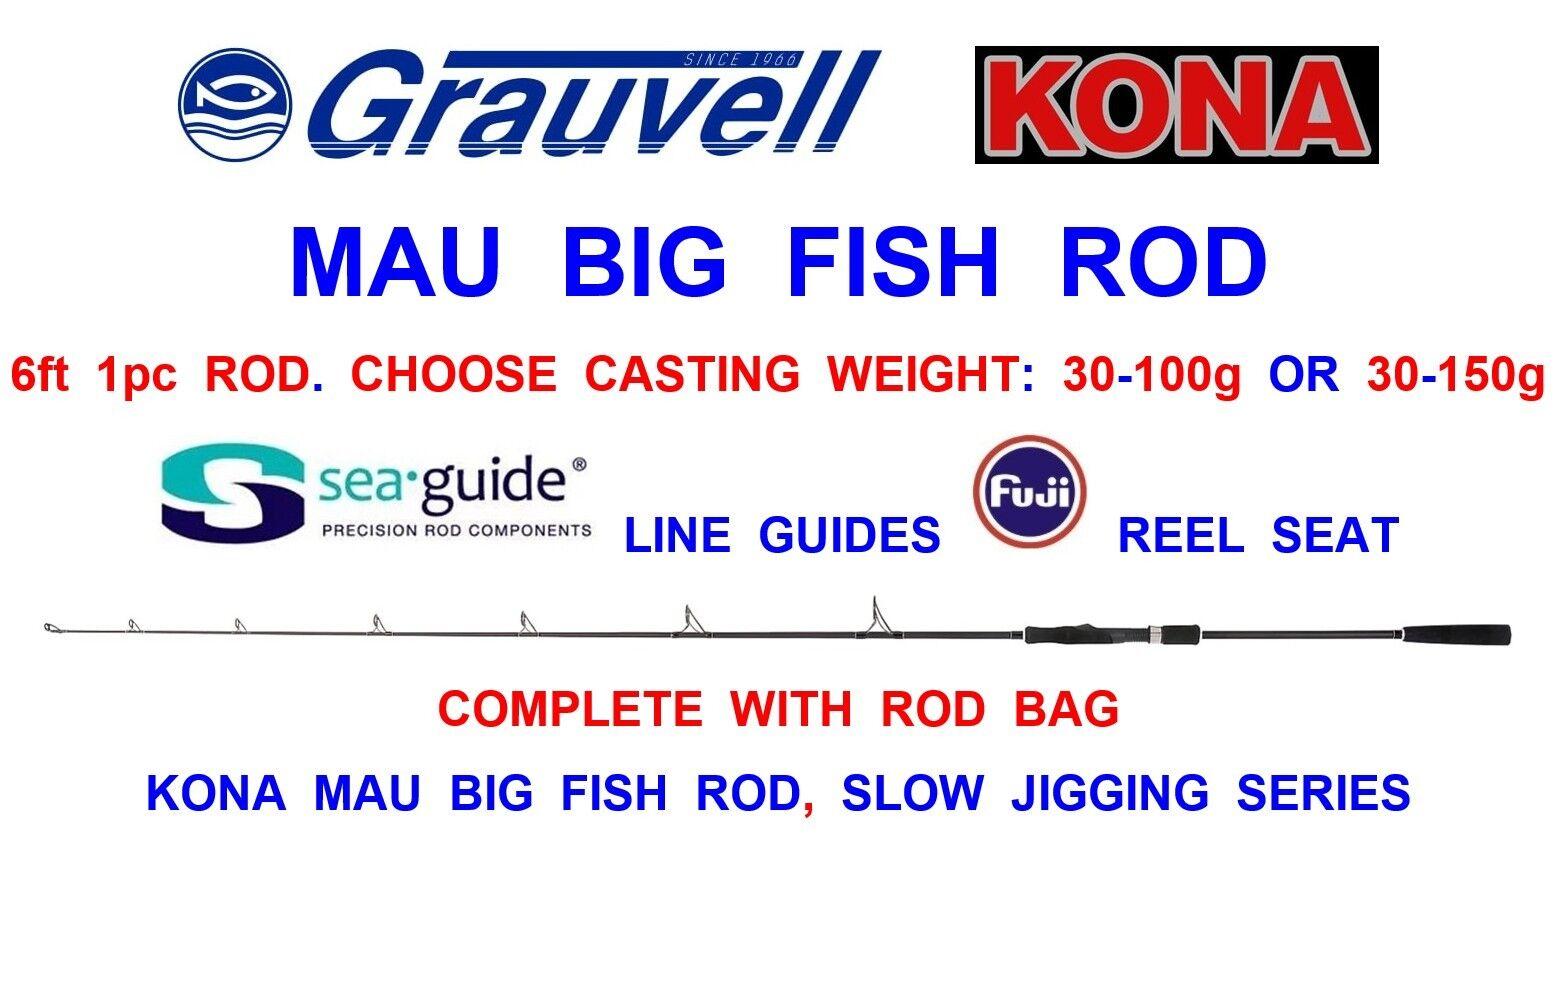 greyVELL KONA MAU BIG FISH ROD SLOW JIGGING BOAT FISHING TROLLING TUNA POPPING